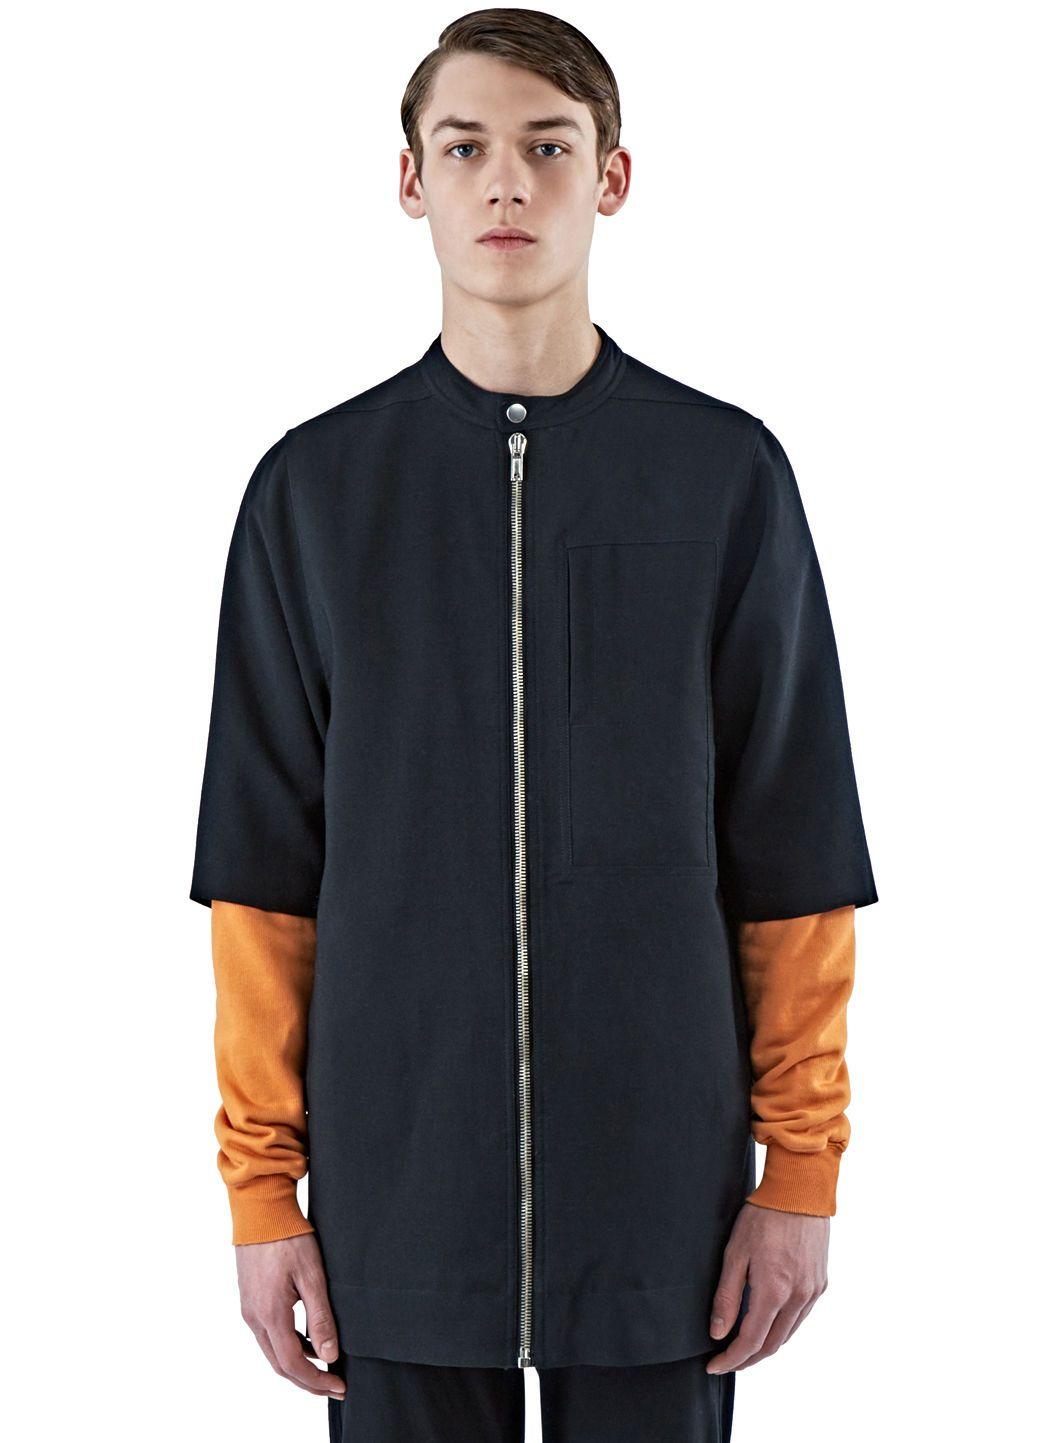 Rick Owens zipped short jacket - Black Extremely Cheap Price Cheap Sale Buy keGmuRk9Fw